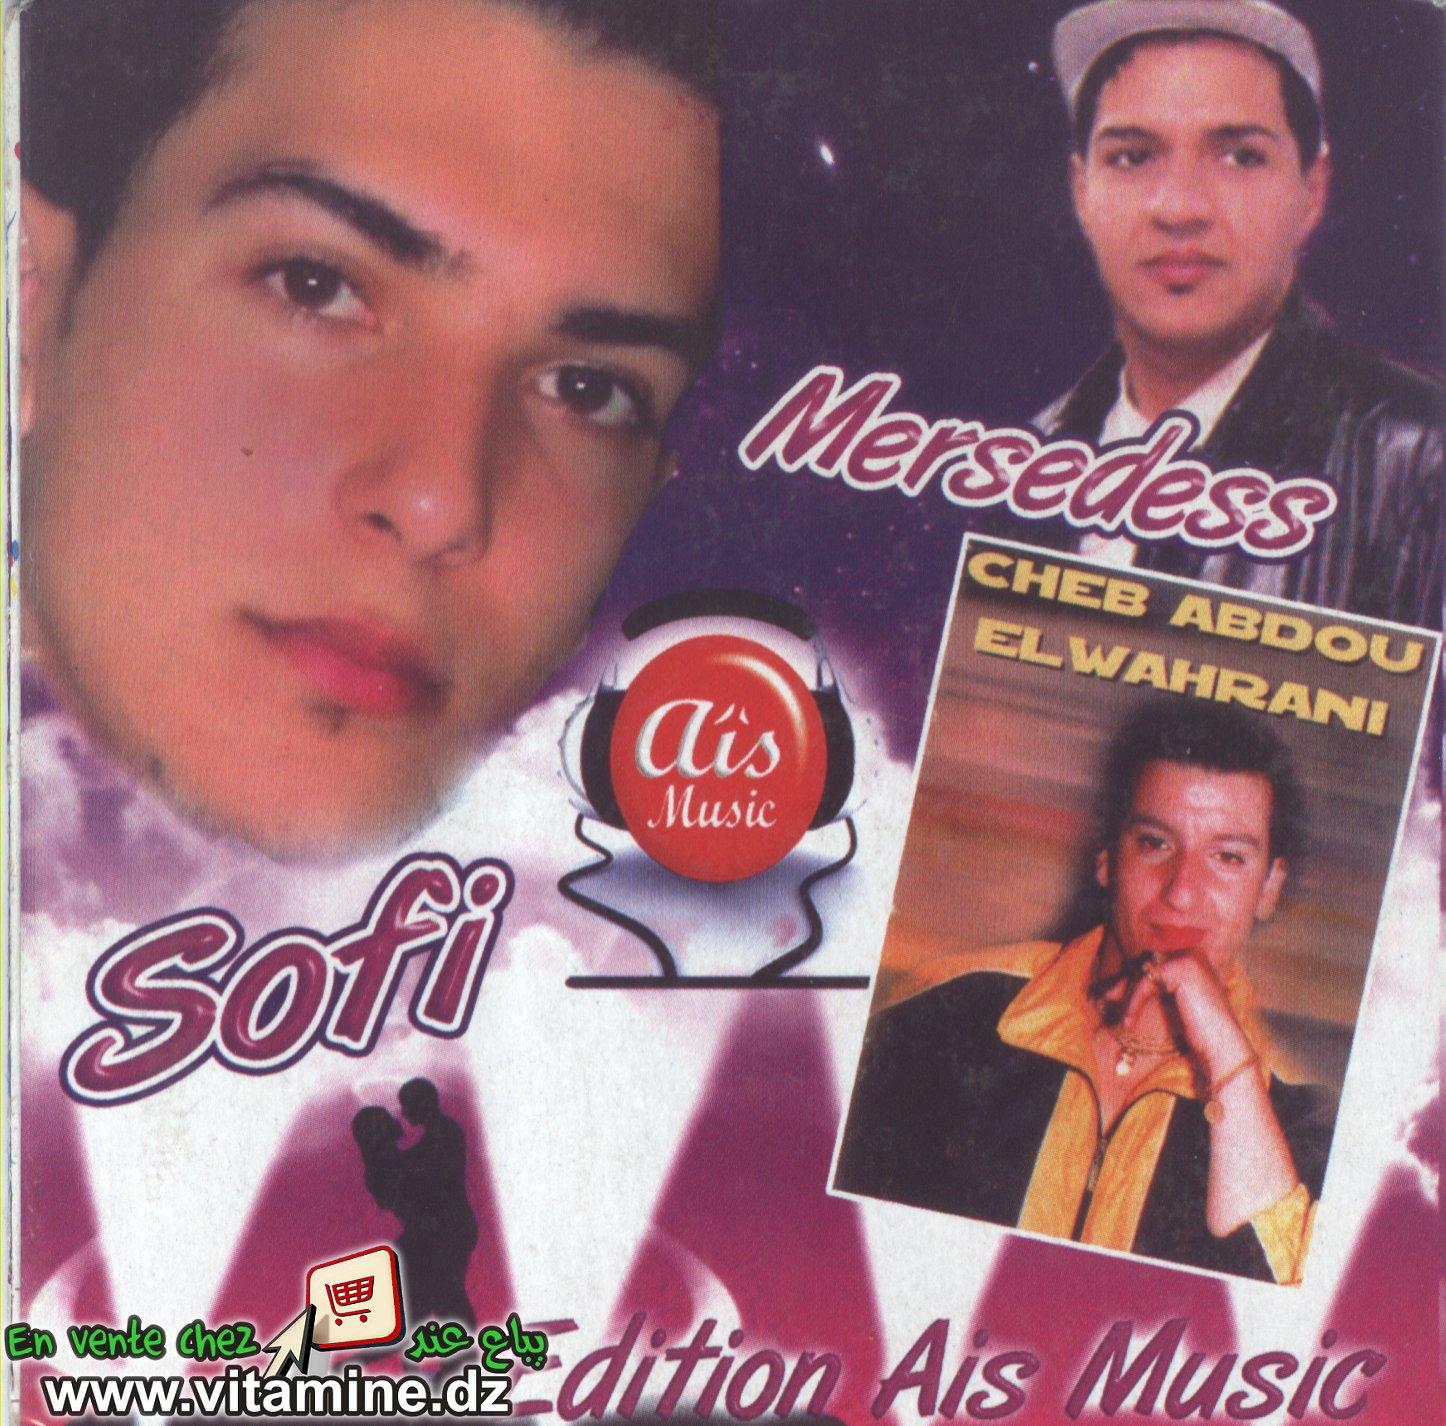 Cheikh Mercedess, Cheb Sofi, Cheb Abdou El Wahrani